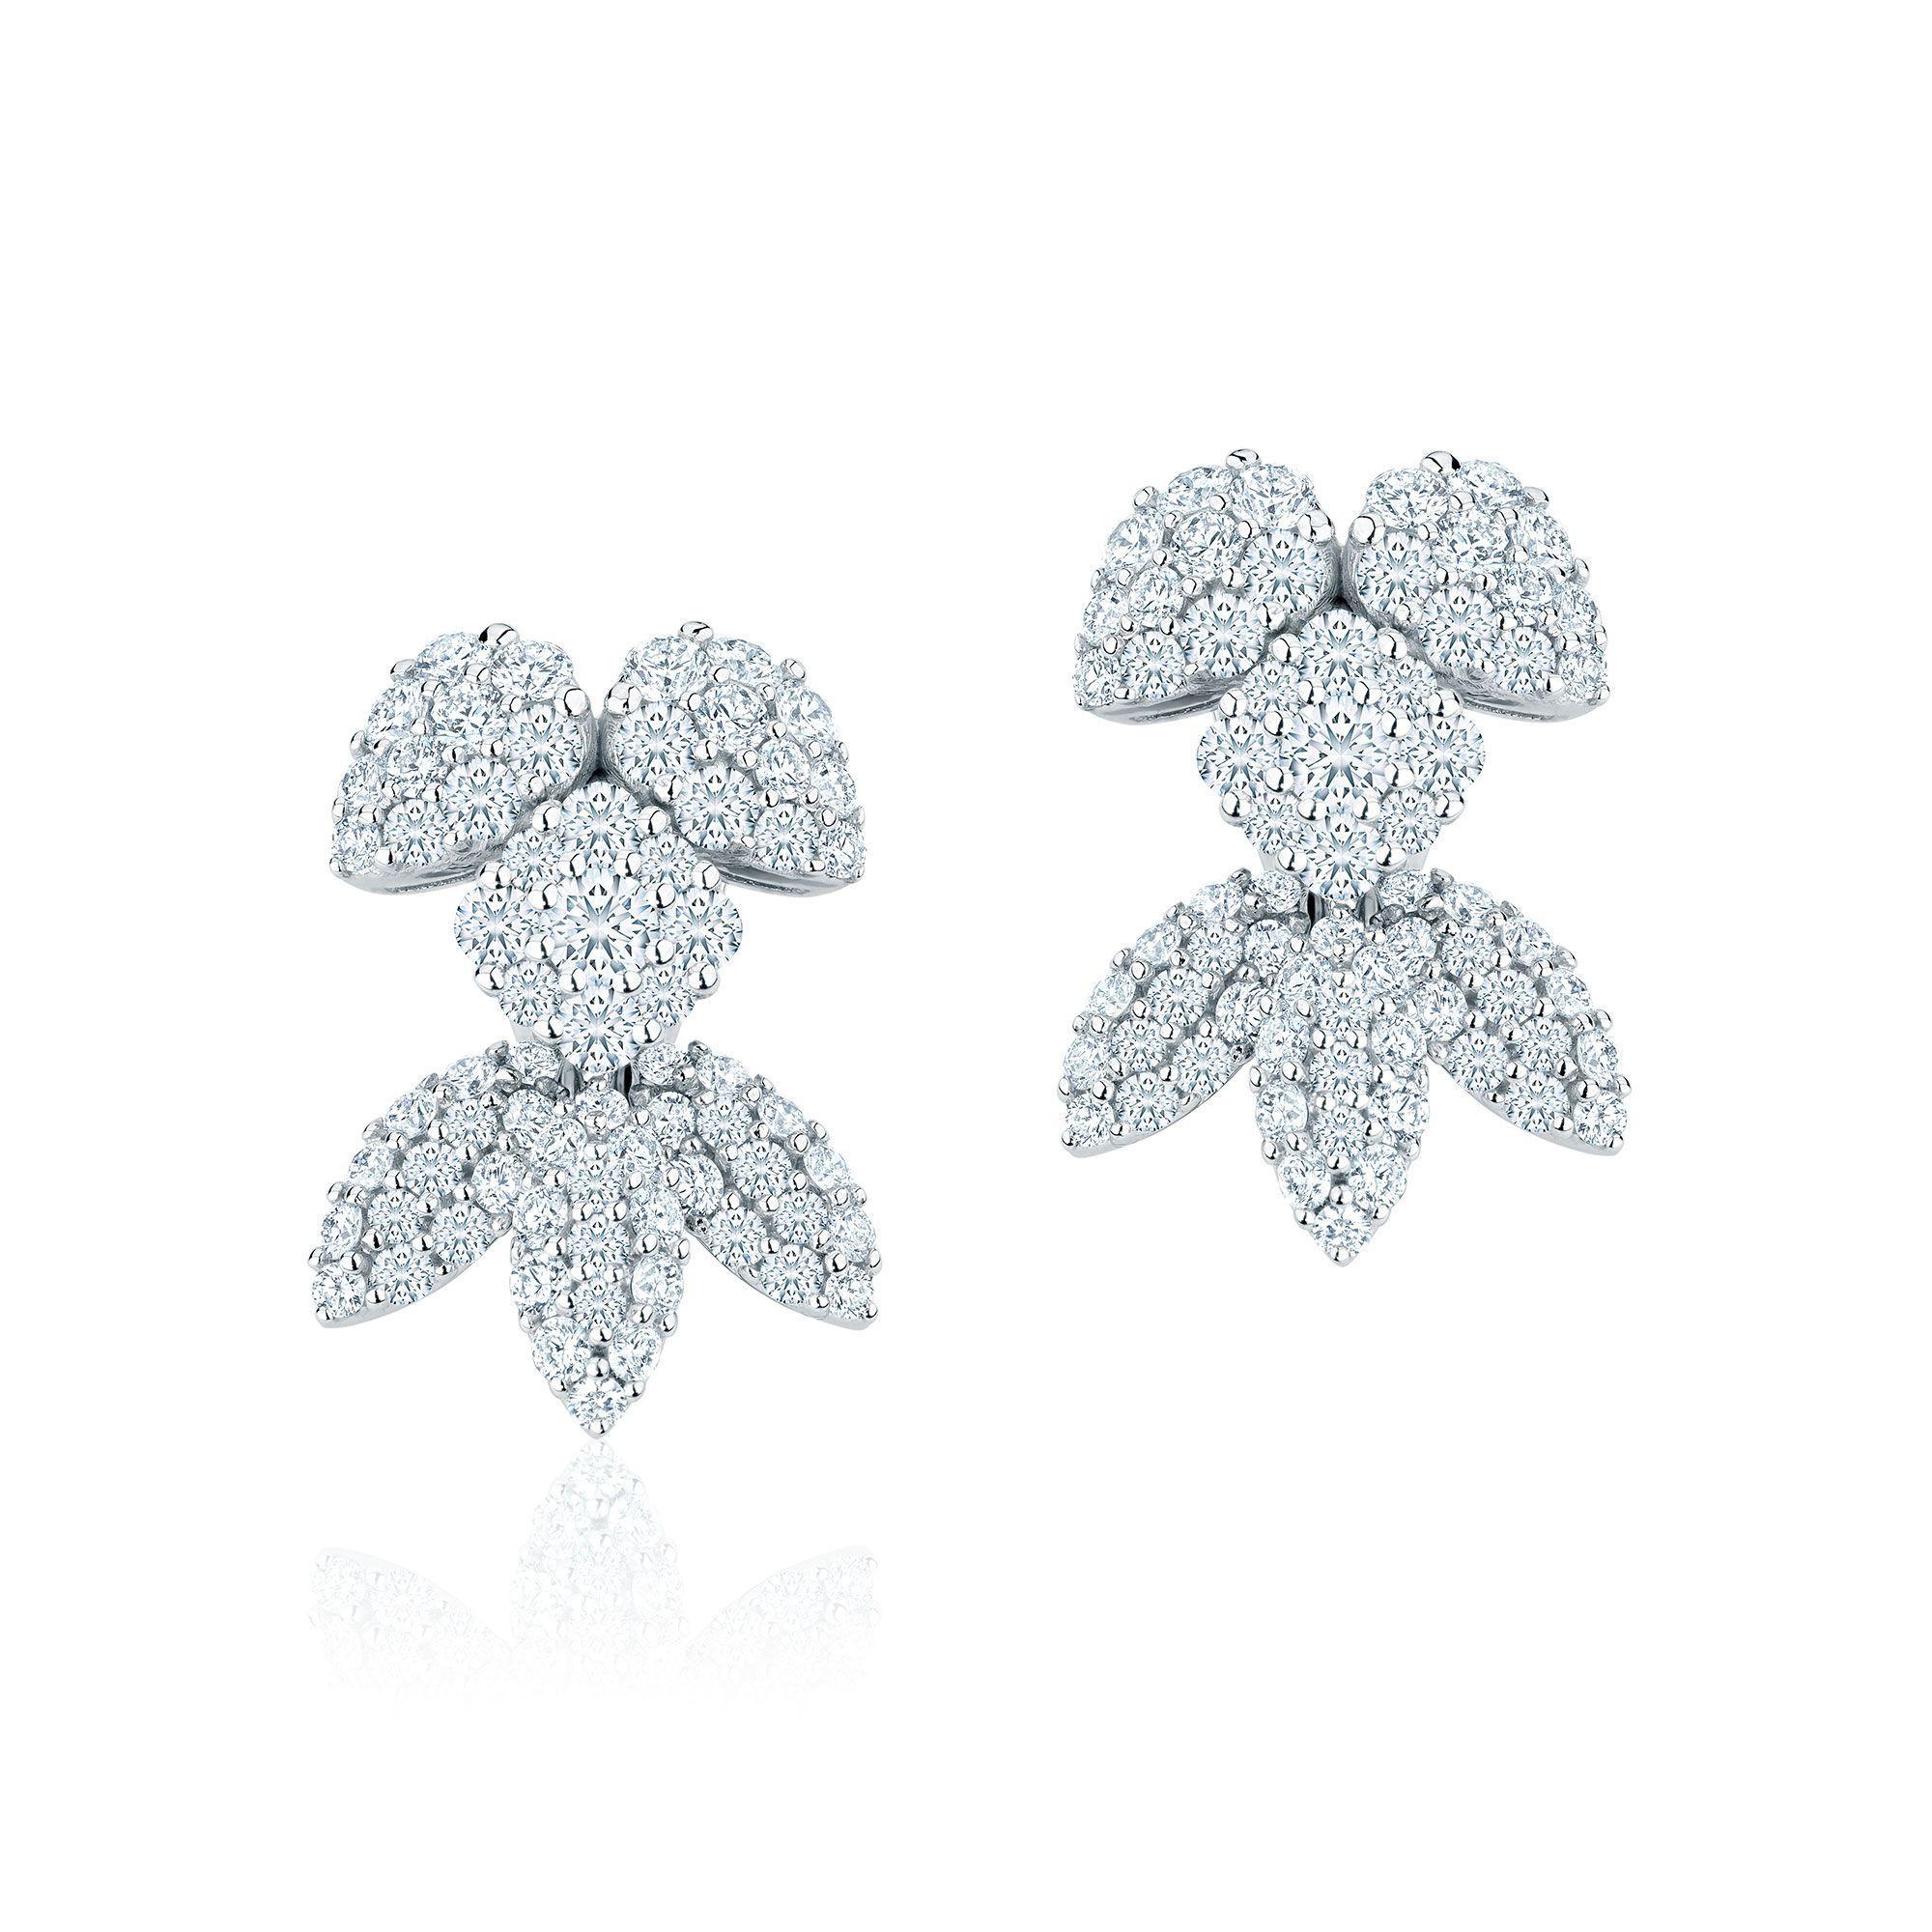 a596880dd5 ... Birks Snowflake Snowstorm Diamond Earrings in White Gold ( 12